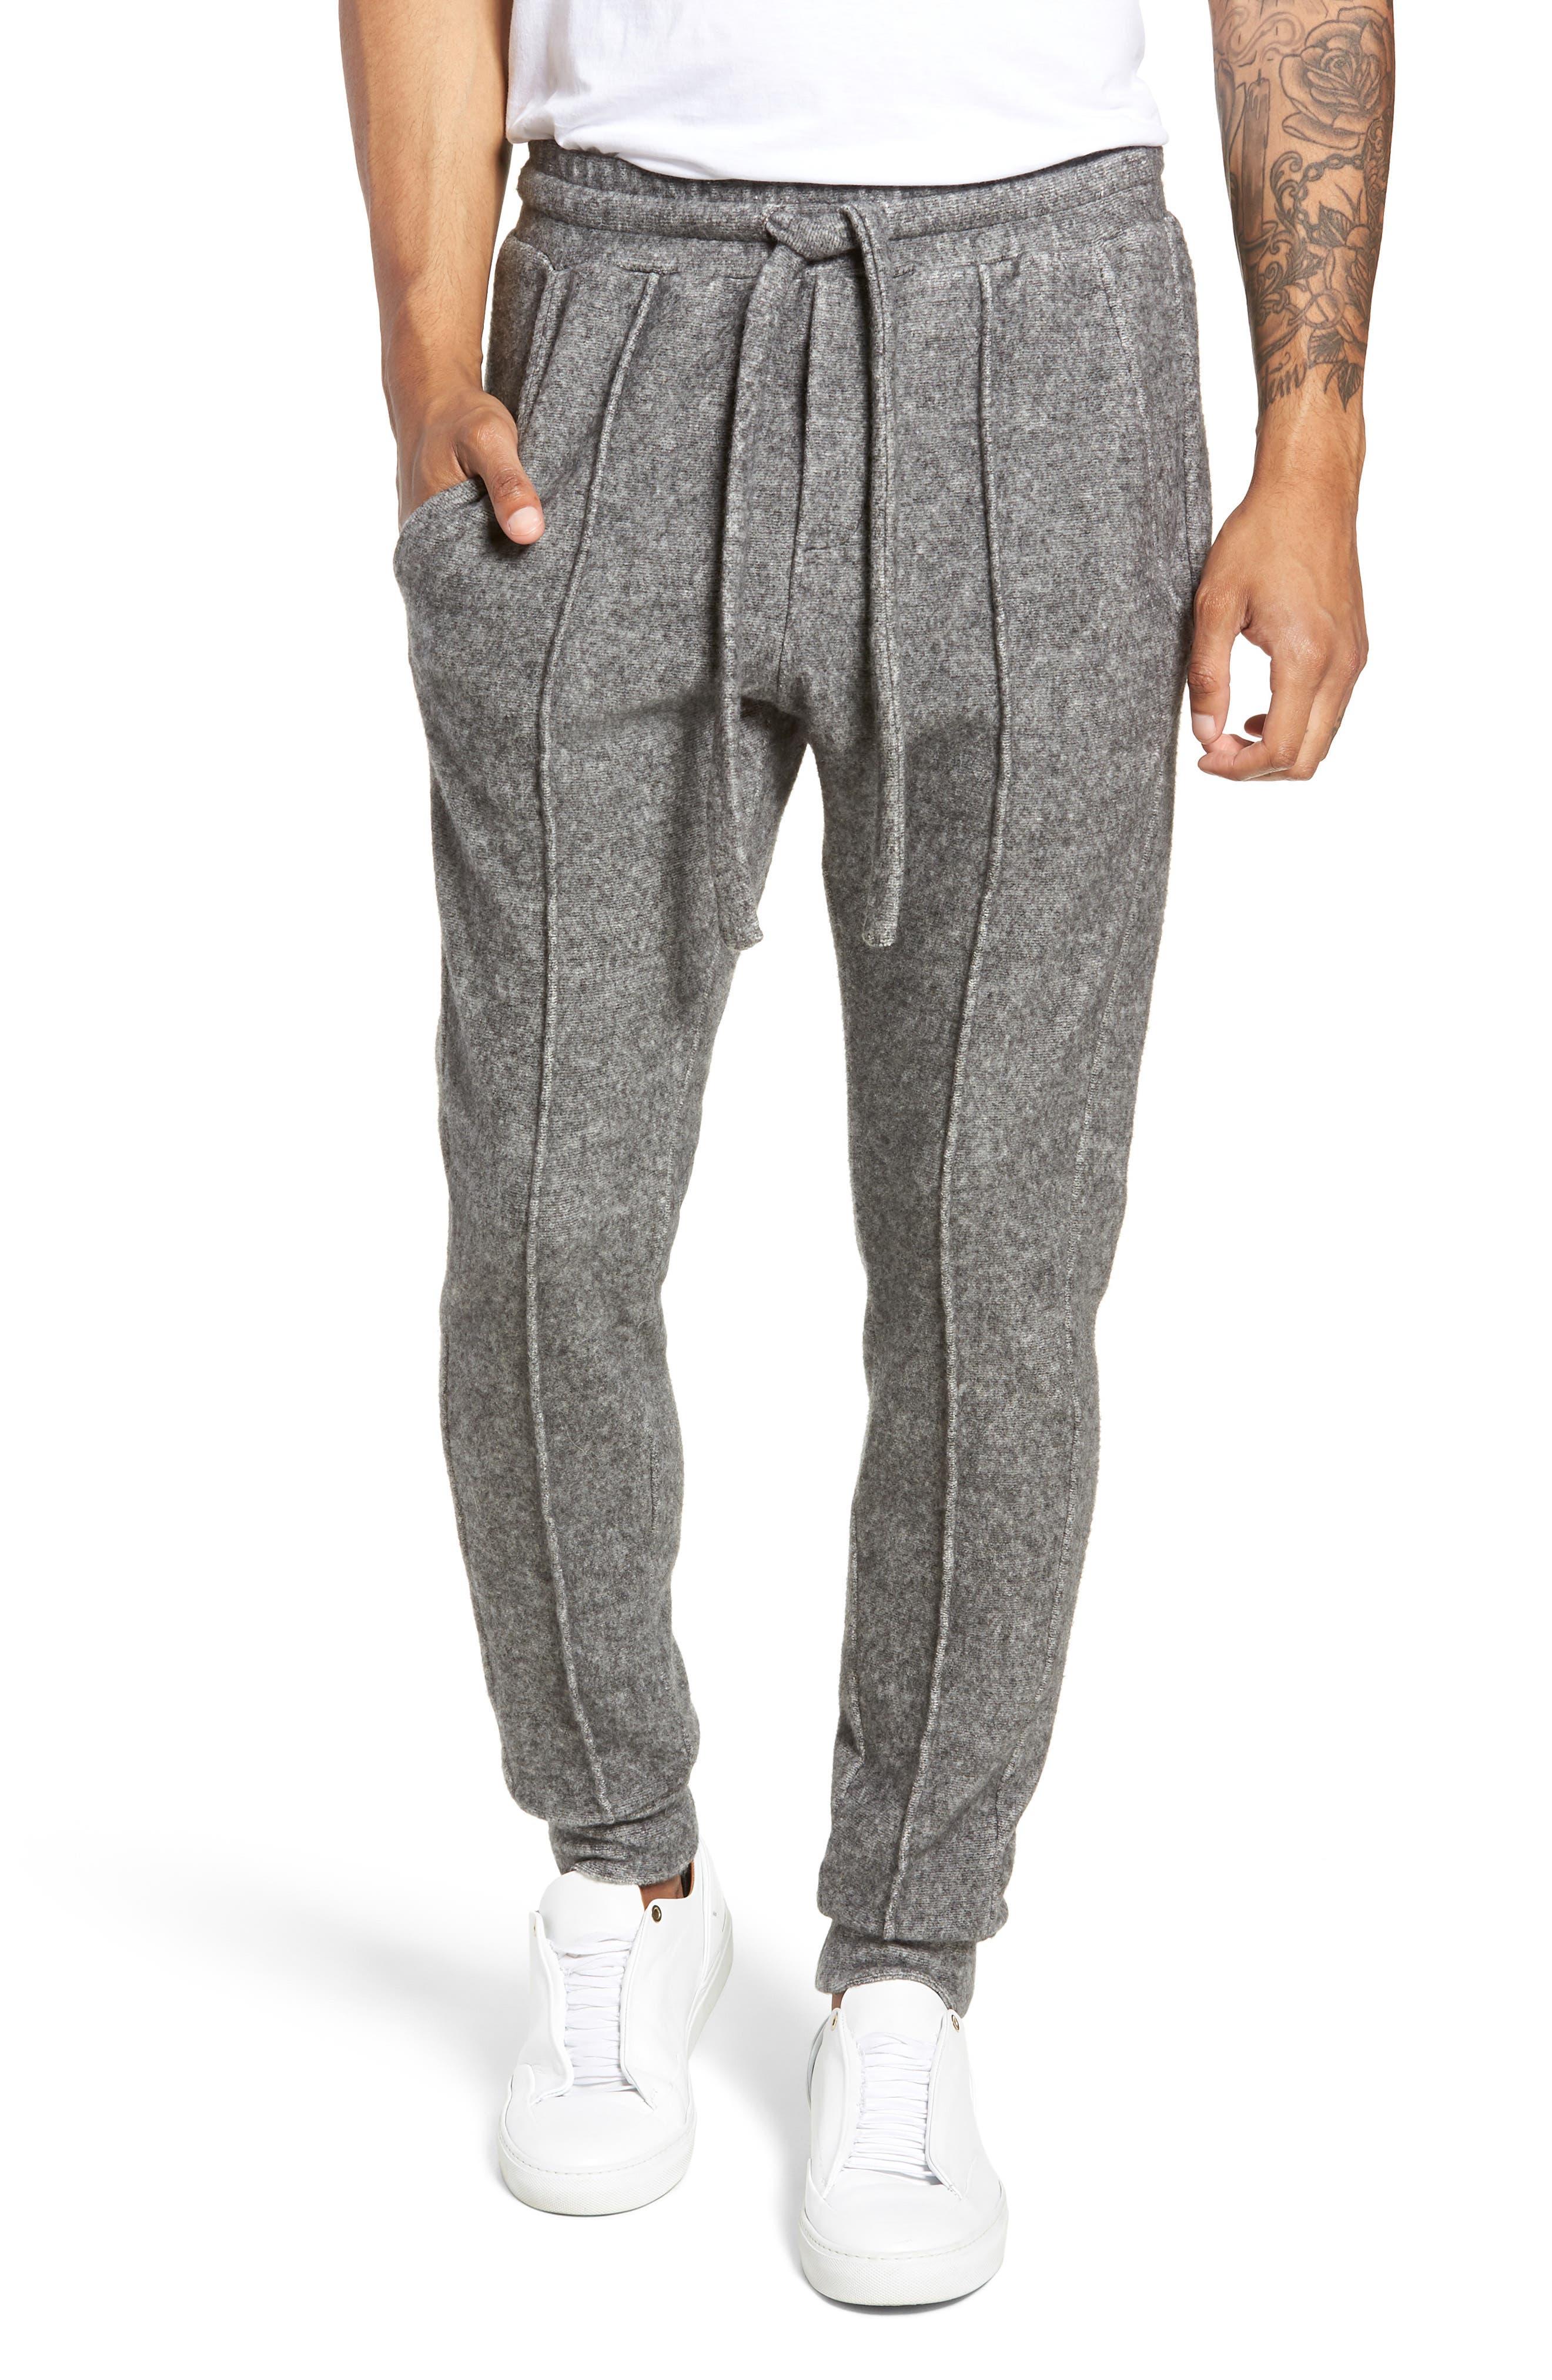 Maddux Slim Fit Jogger Pants,                             Main thumbnail 1, color,                             HEATHER GREY